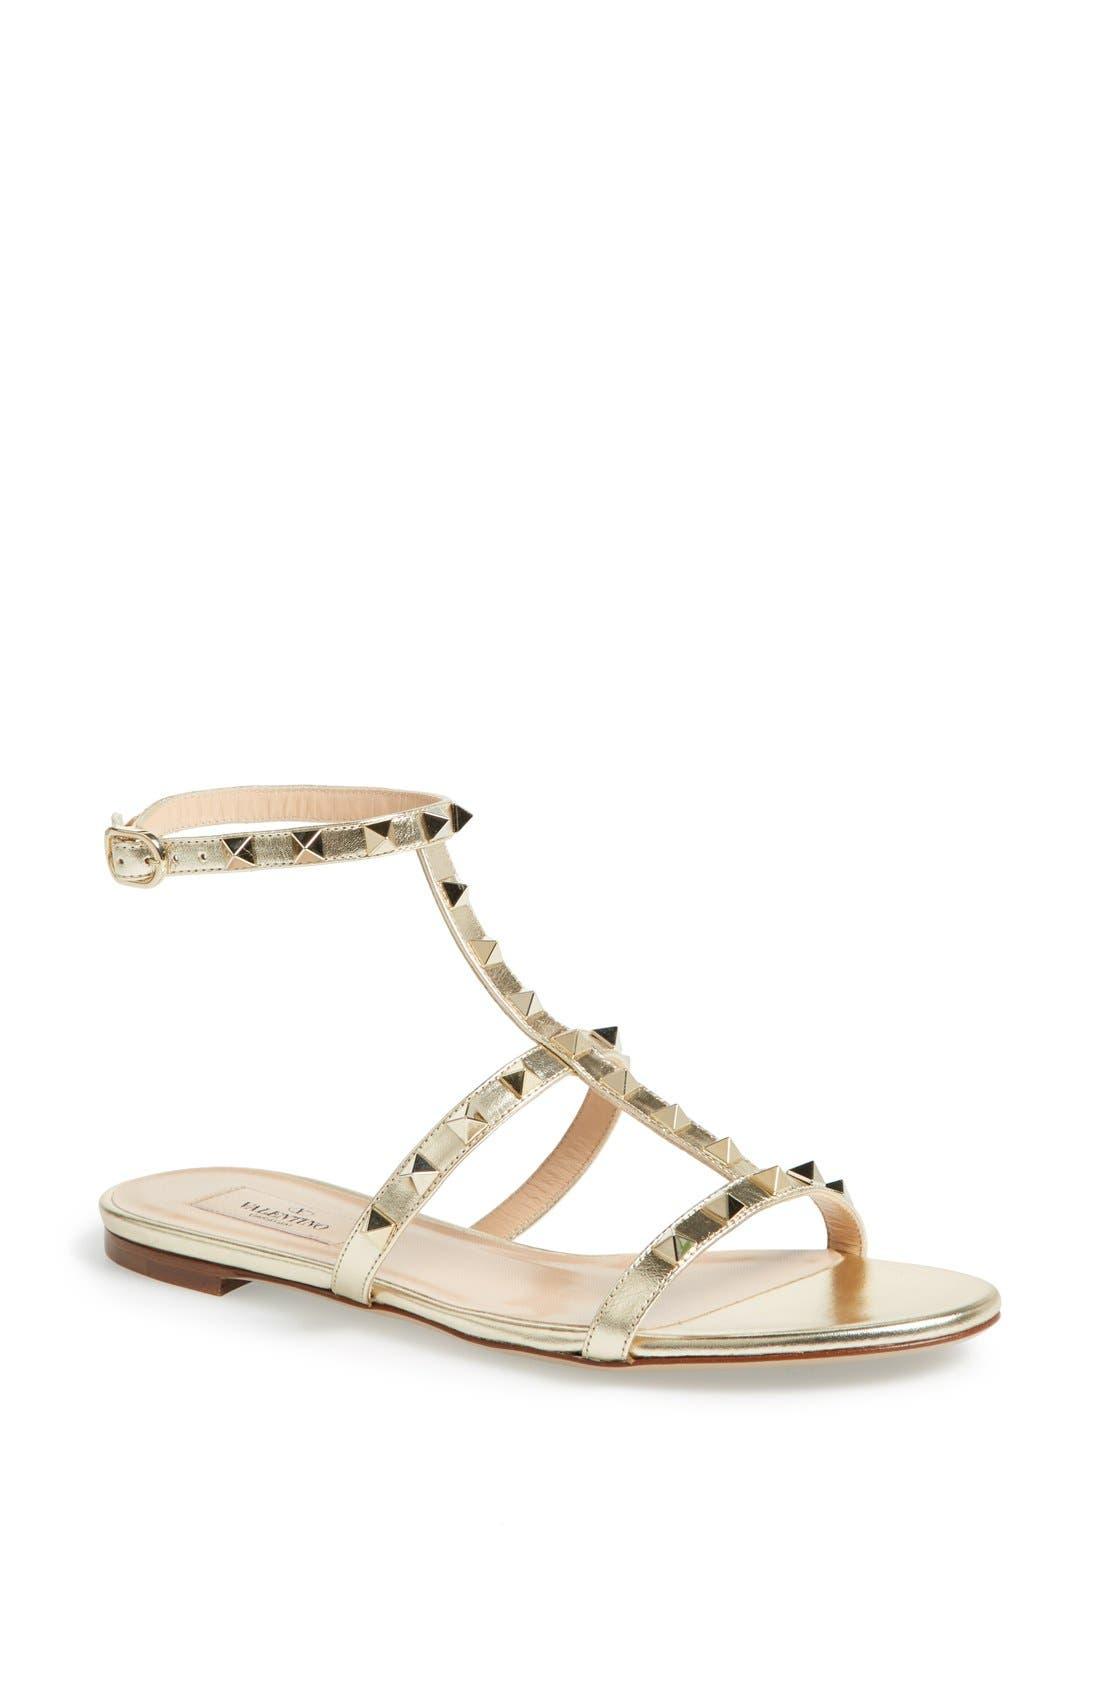 Alternate Image 1 Selected - Valentino 'Rockstud' T-Strap Sandal